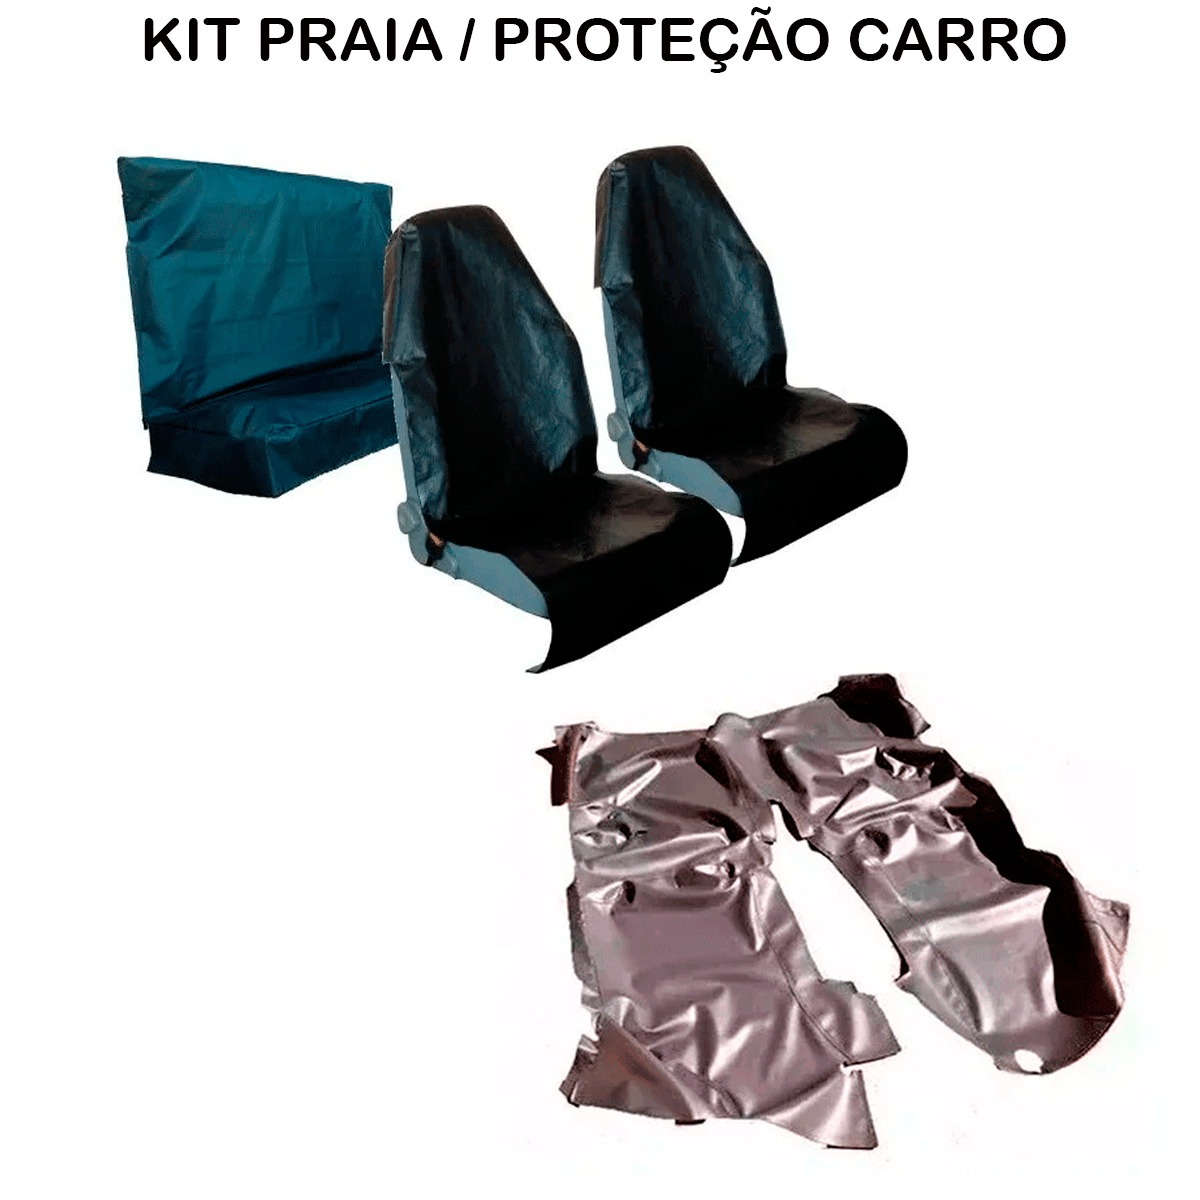 Tapete Em Vinil Volkswagen Golf 2008 a 2013 + Capa Banco Protecao Banco Areia Suor Academia